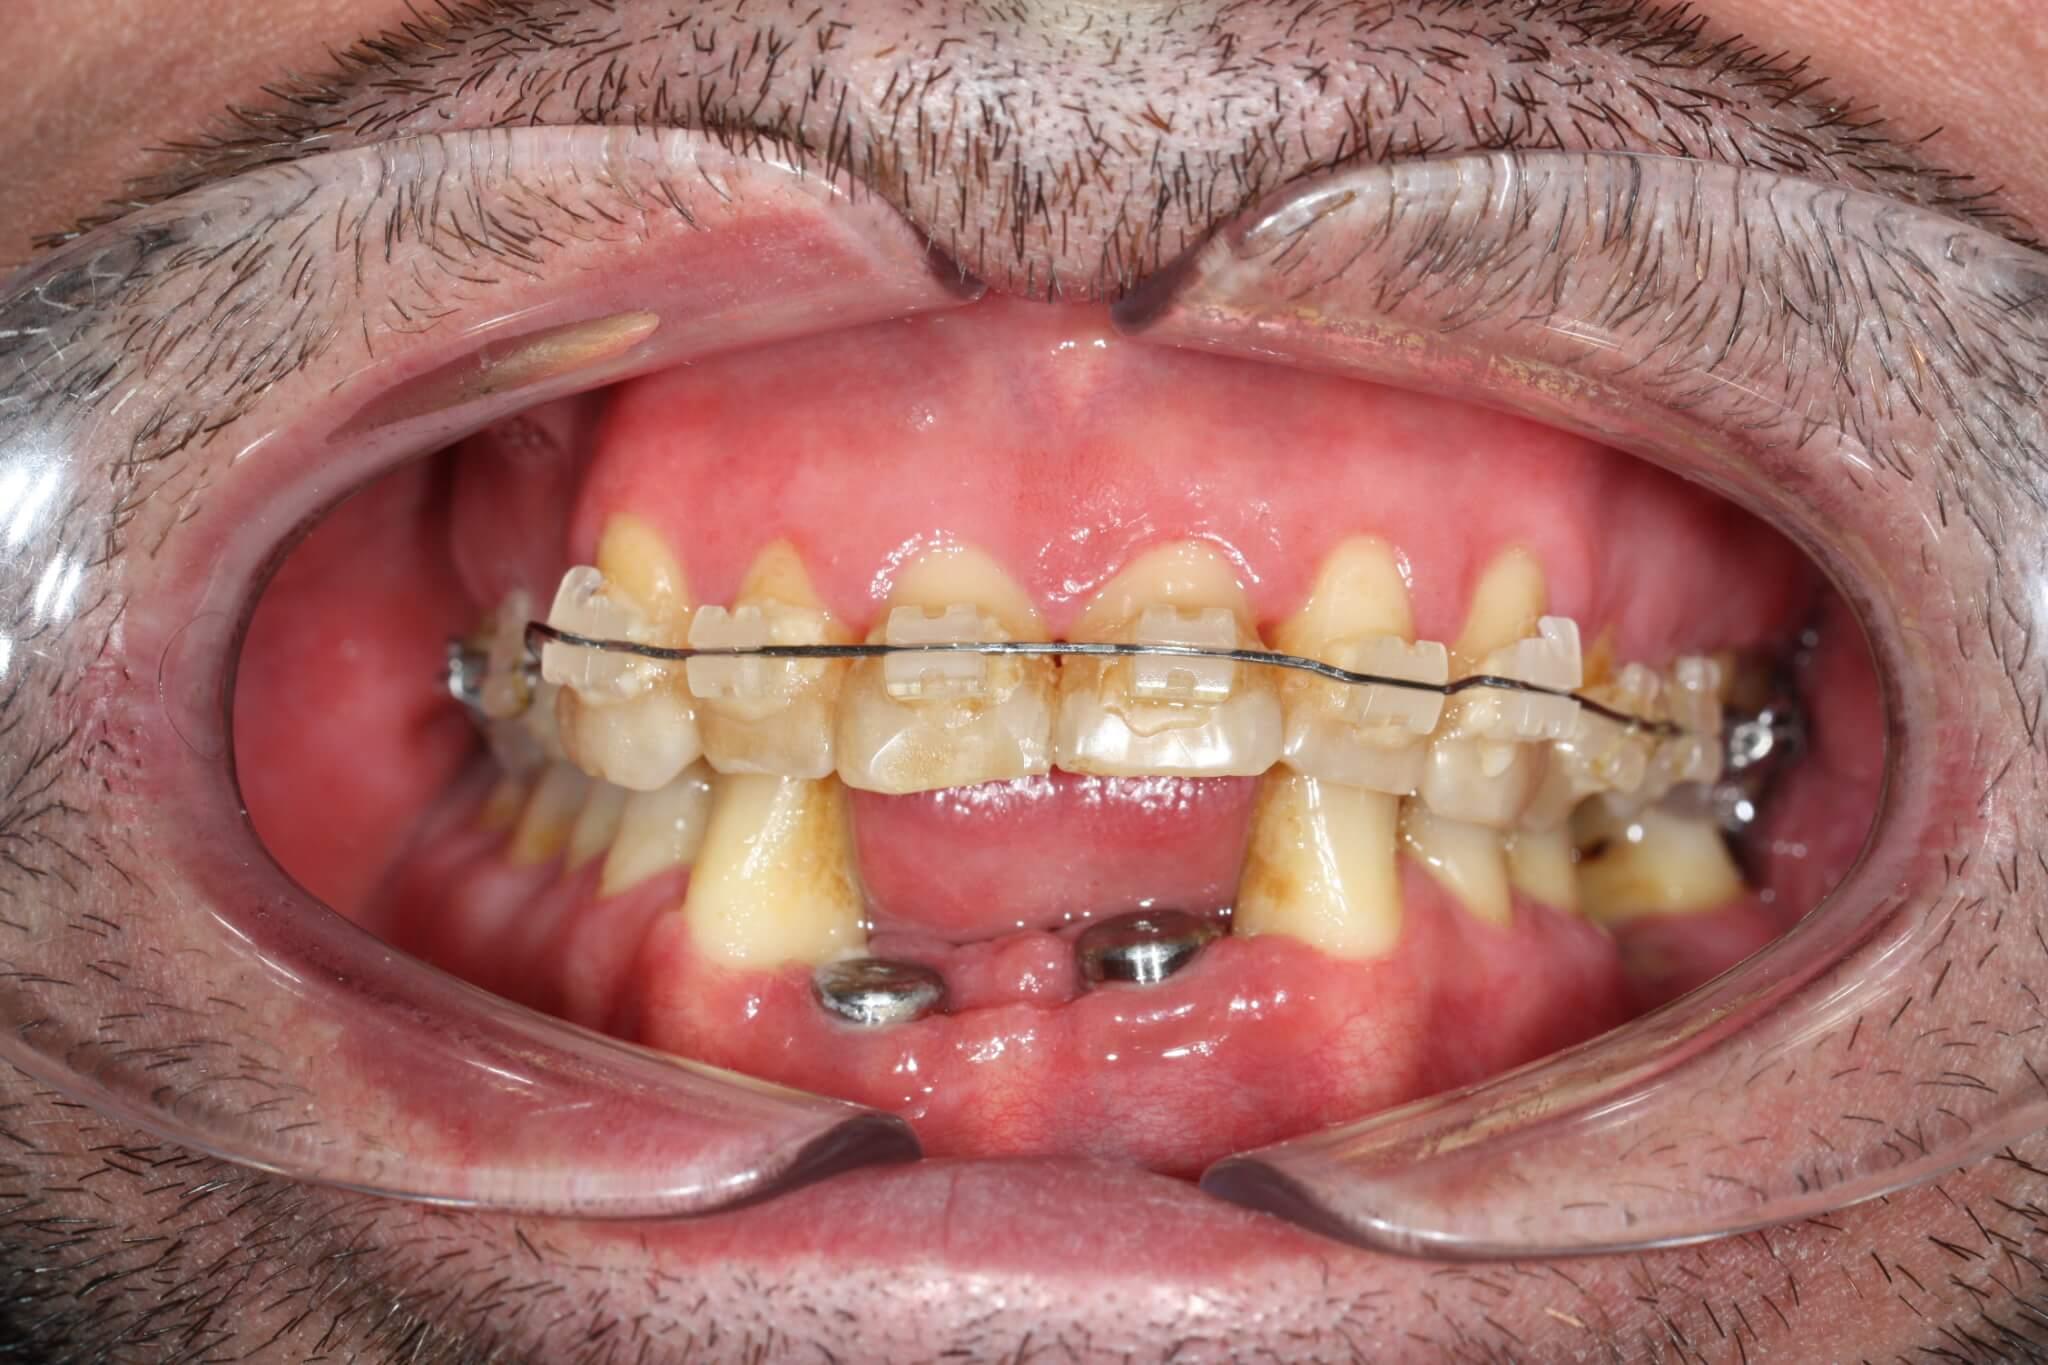 modificacion-de-la-sonrisa-con-brackets-de-porcelana-e-implantes-2